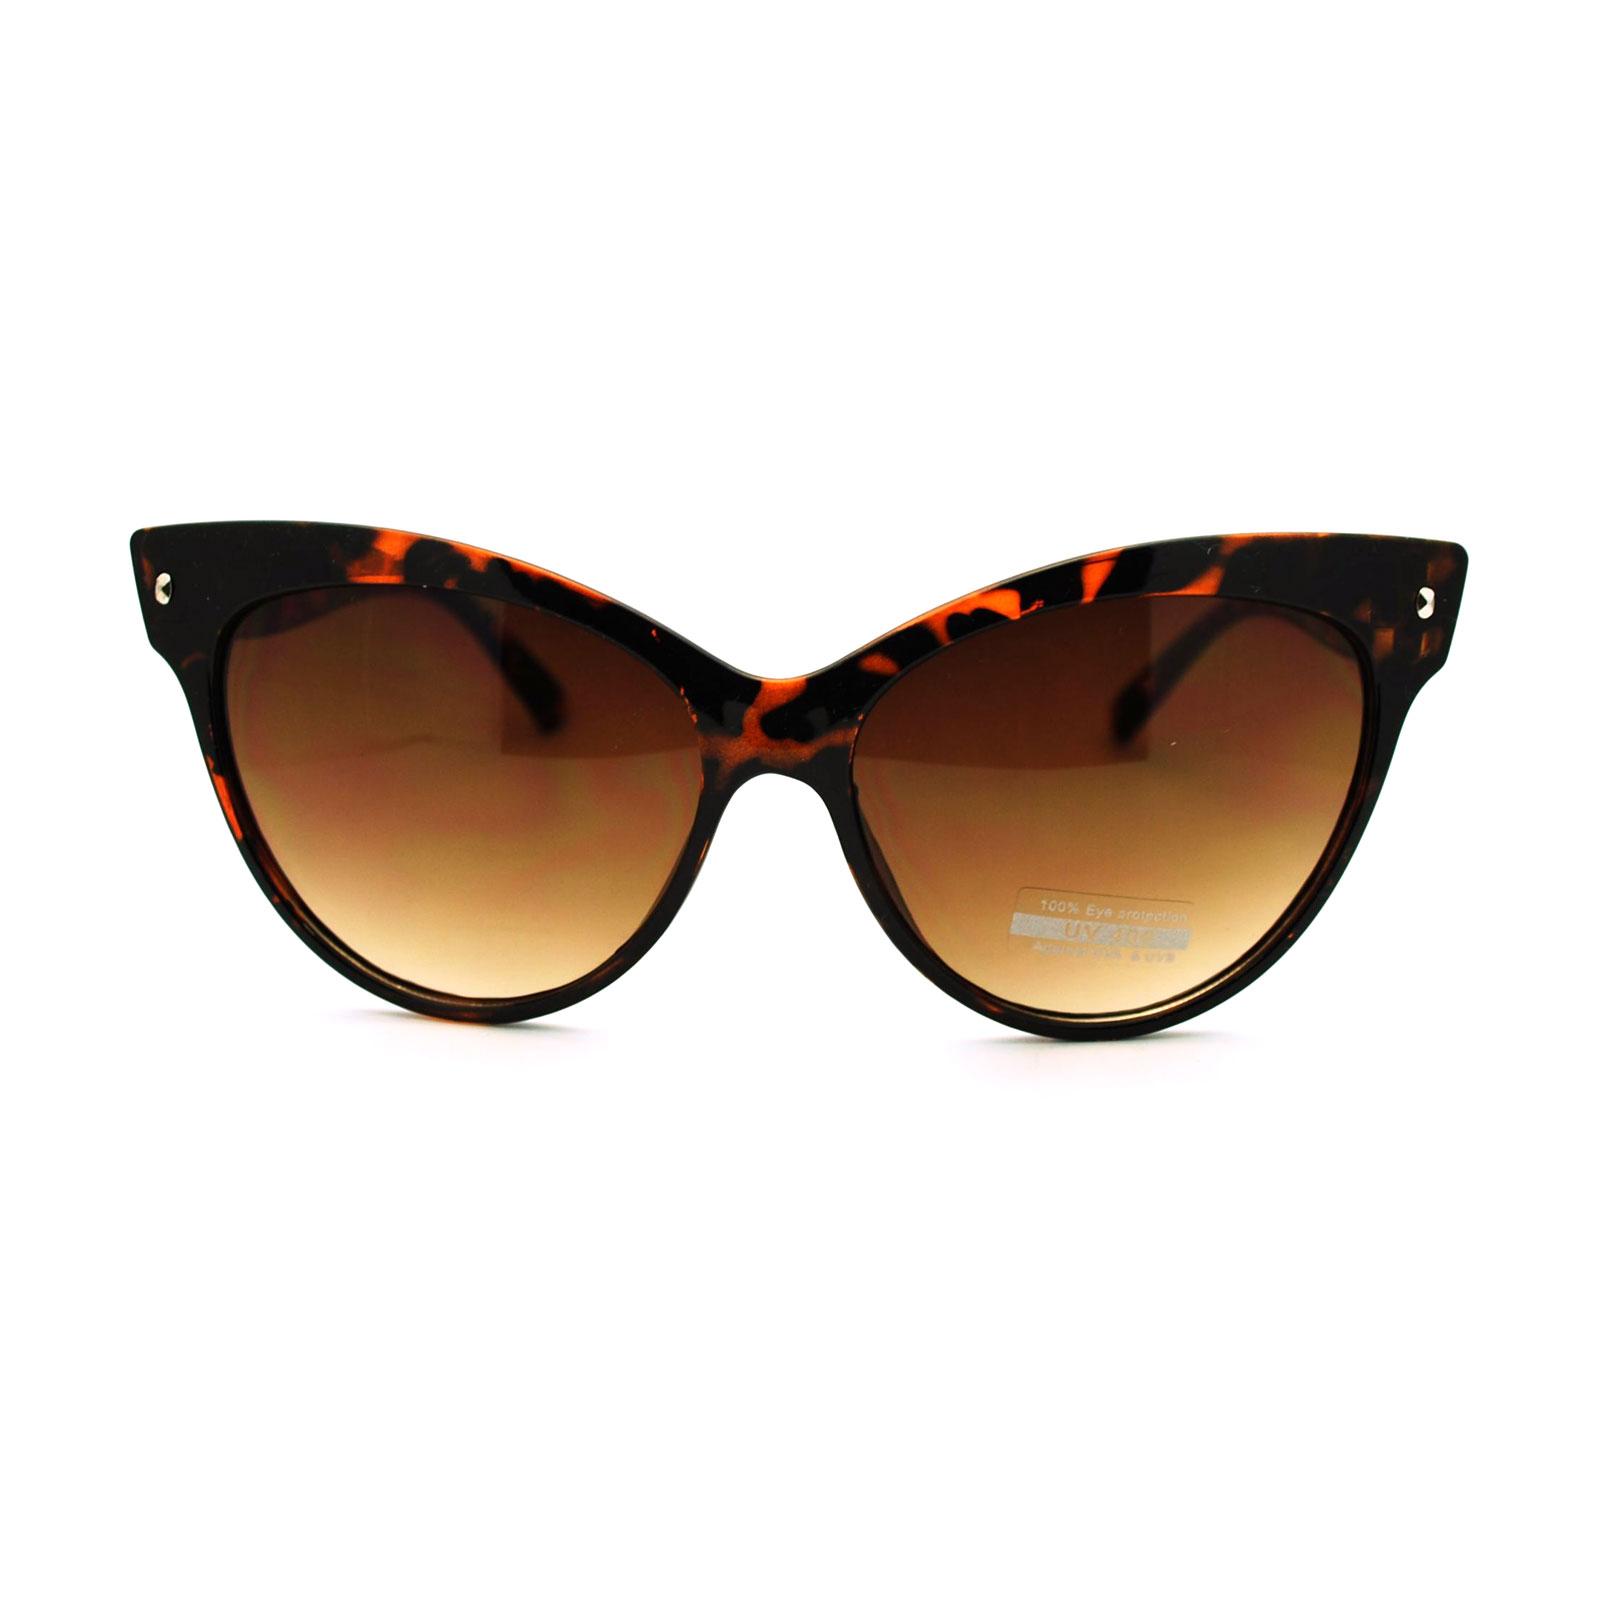 Trendy Girly Oversized Cat Eye Sunglasses | eBay